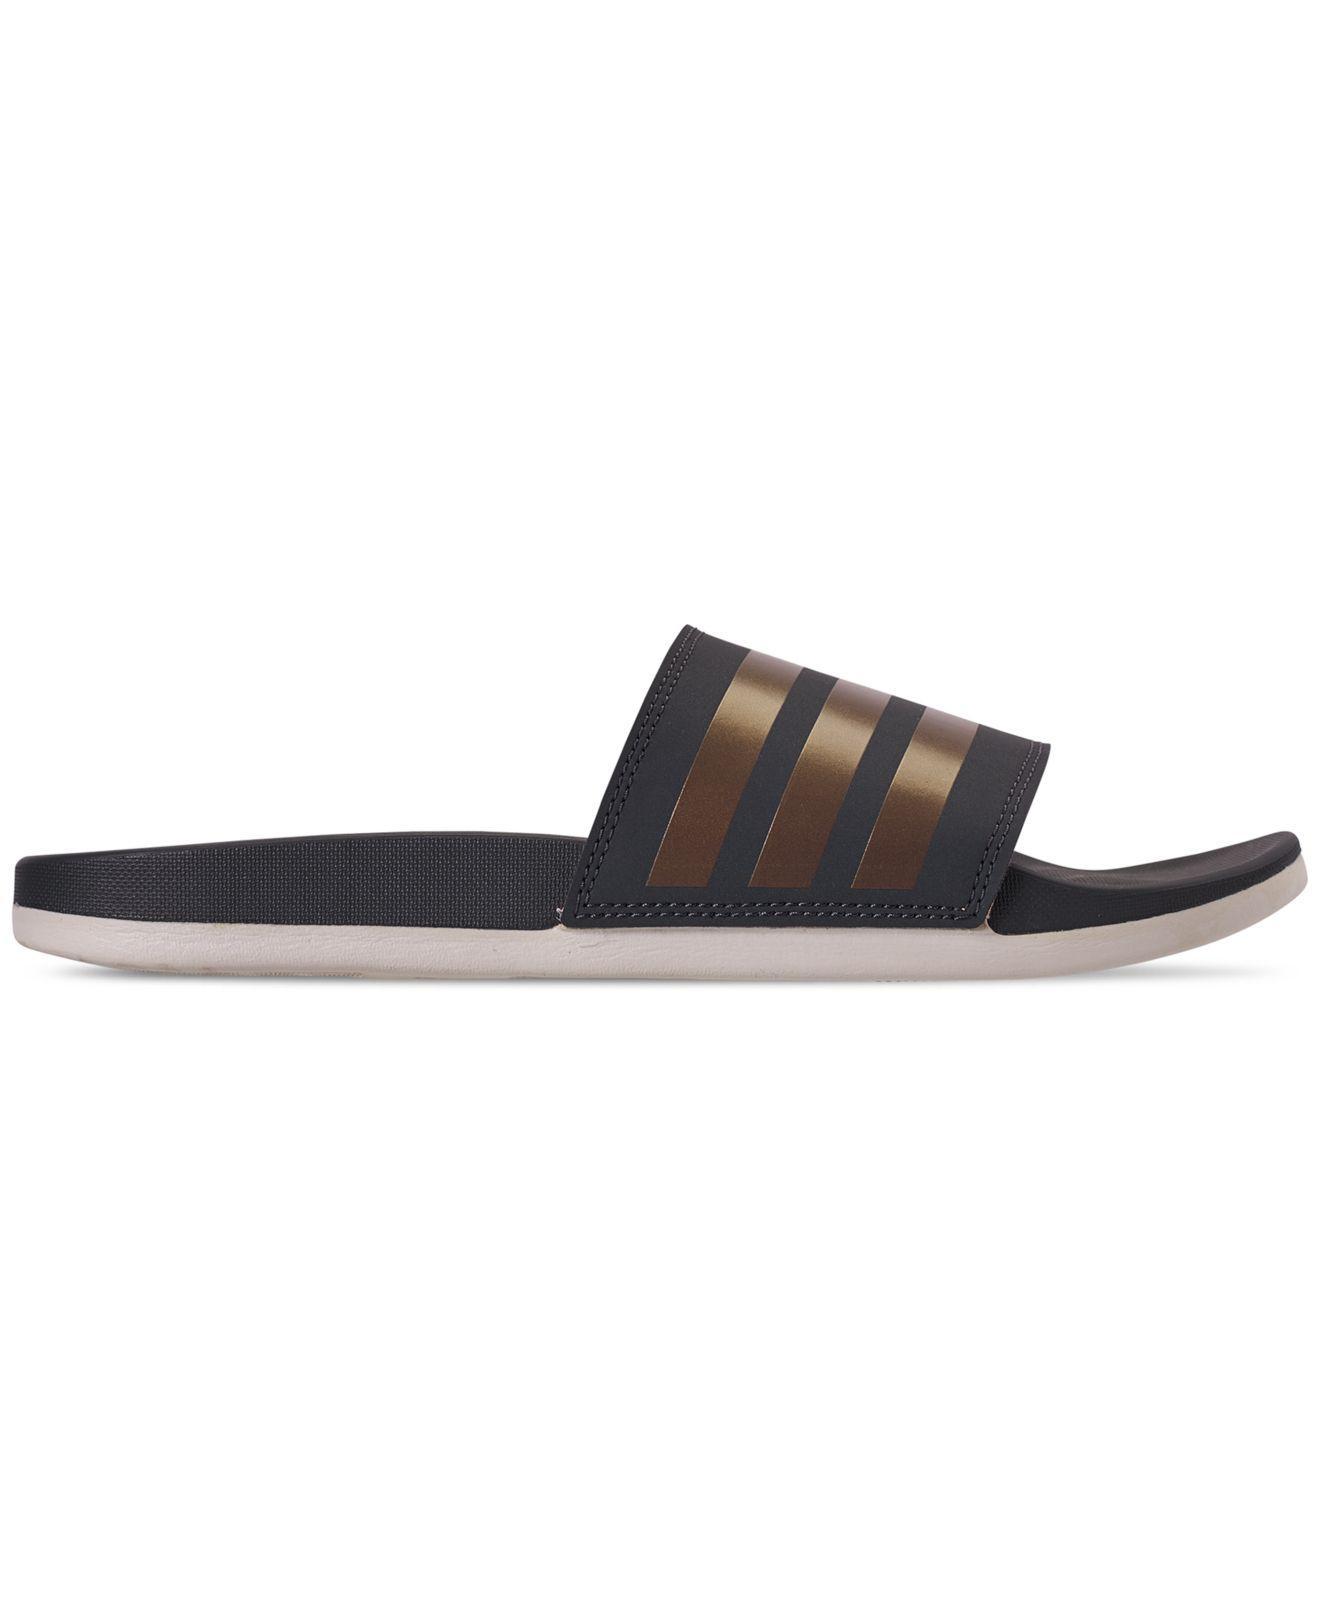 aede93fe5f833 Lyst - adidas Adilette Comfort Slide Sandals - Save 26%